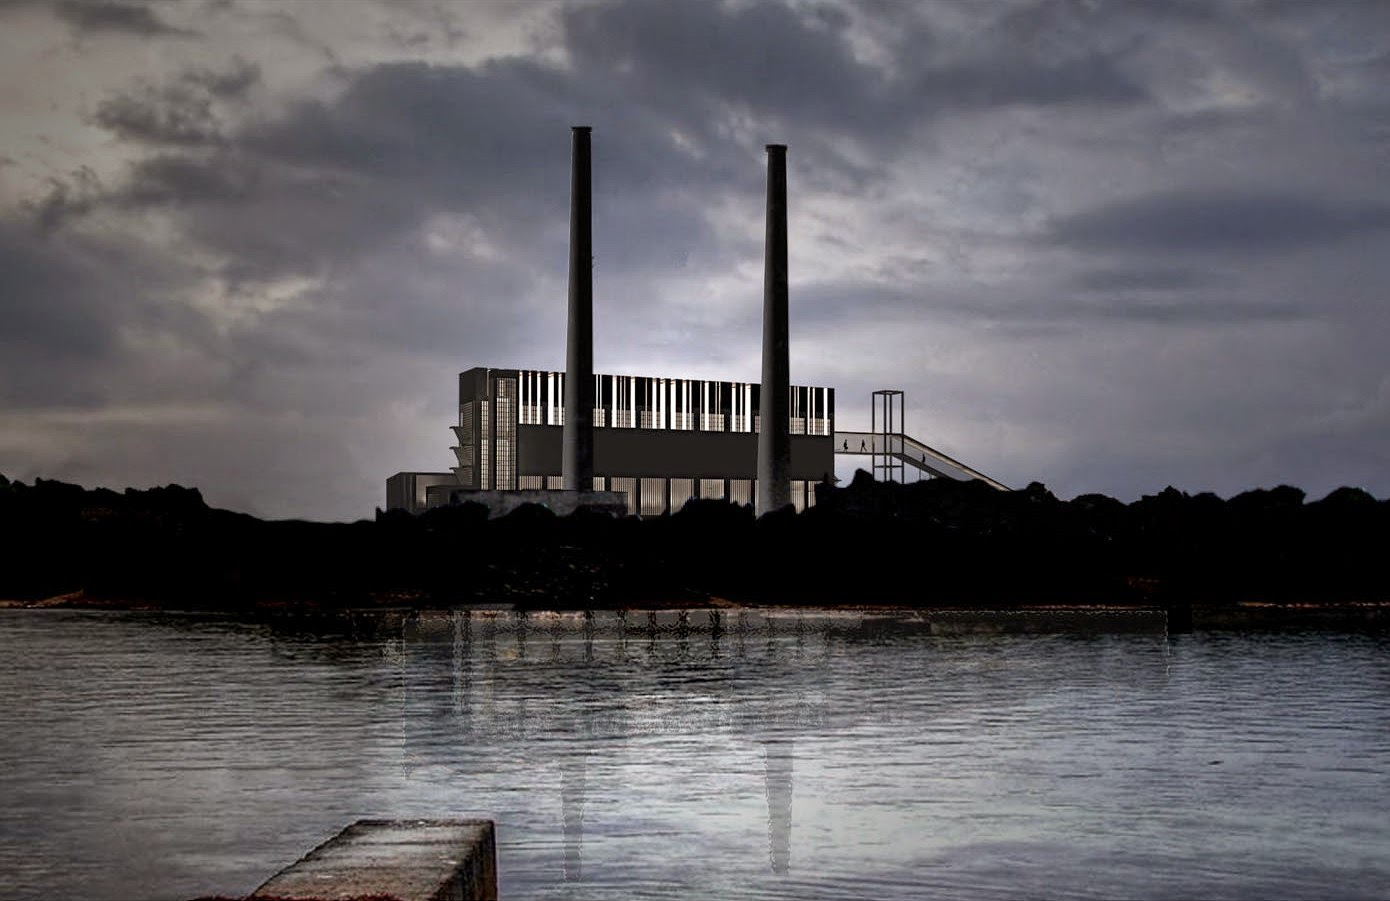 Industriale Paesaggi  wwwmiglioreimmaginicom